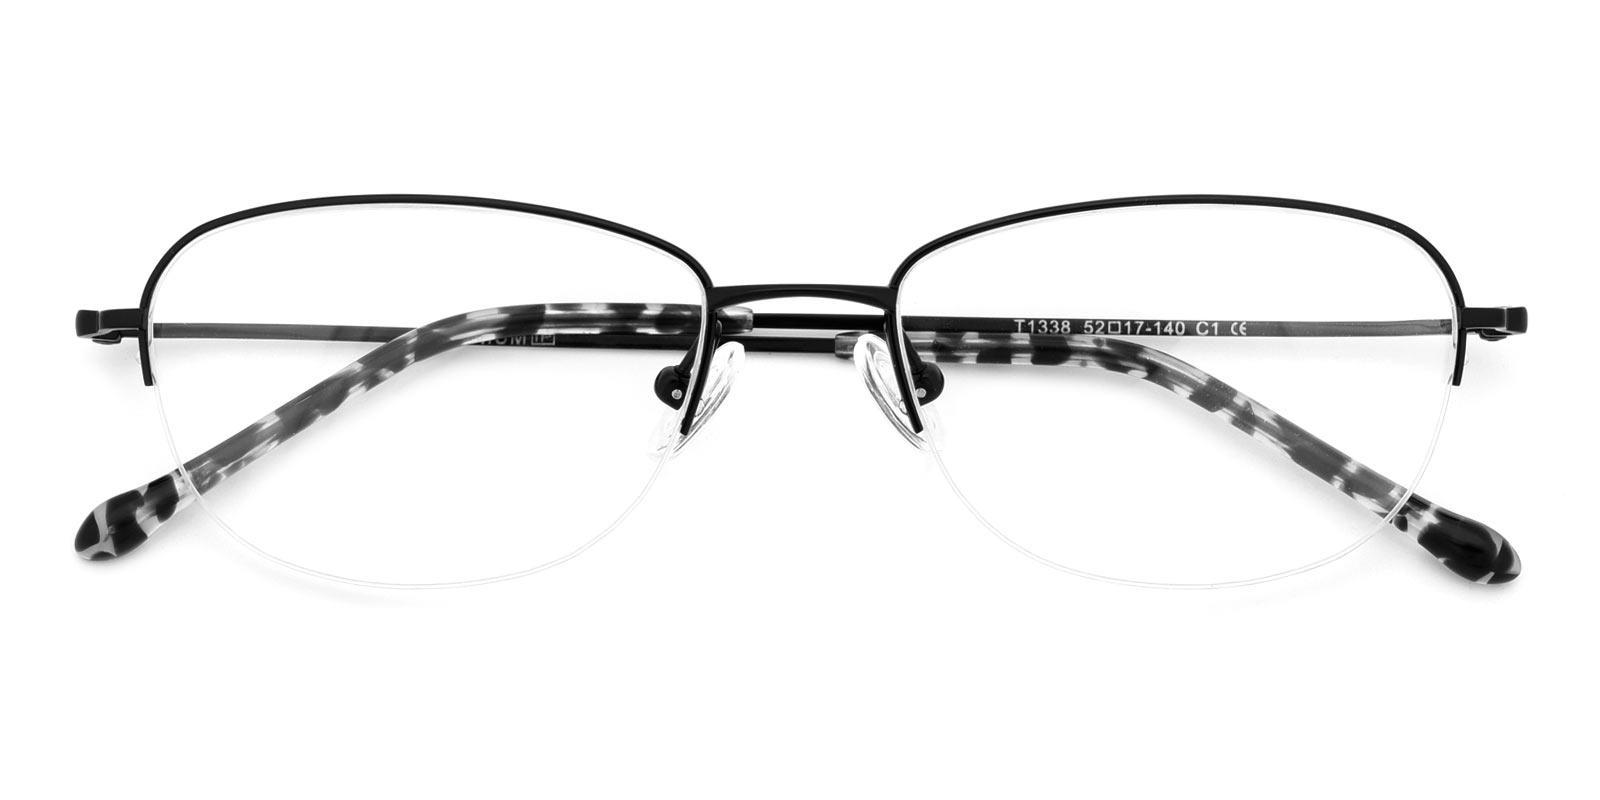 Melody-Black-Oval-Titanium-Eyeglasses-detail